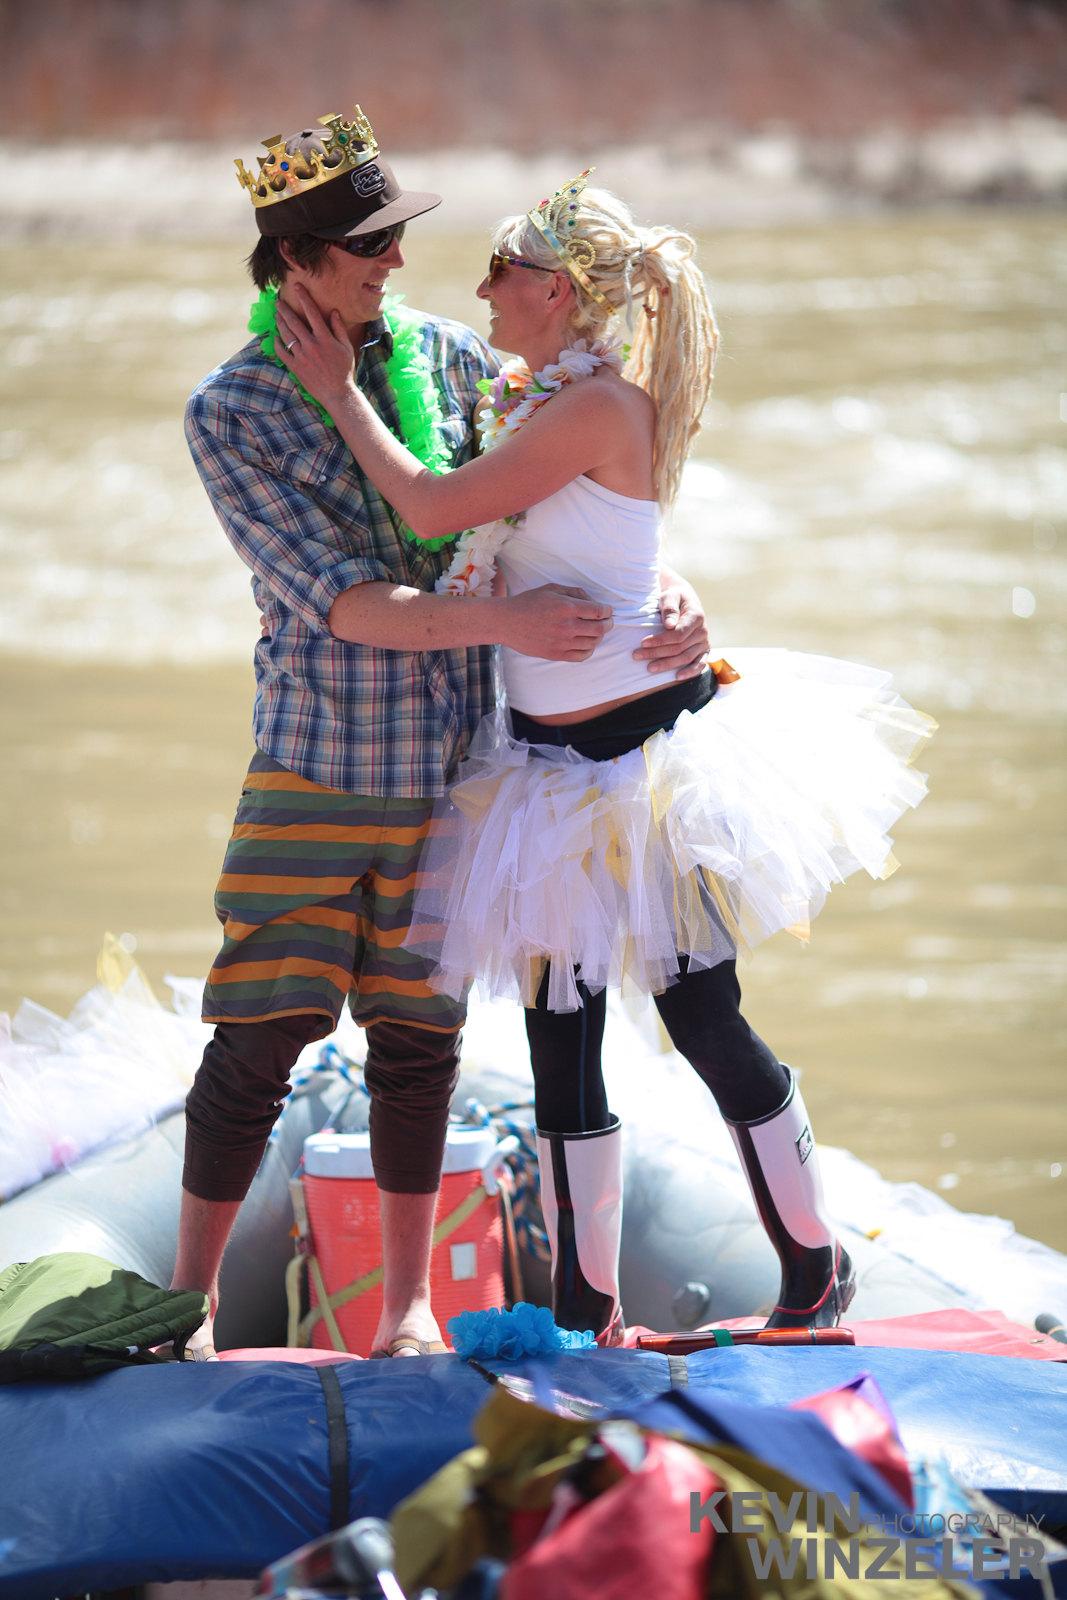 Ericah schiavone and randy winzeler diy tutu wedding river for Wedding dress cleaning utah